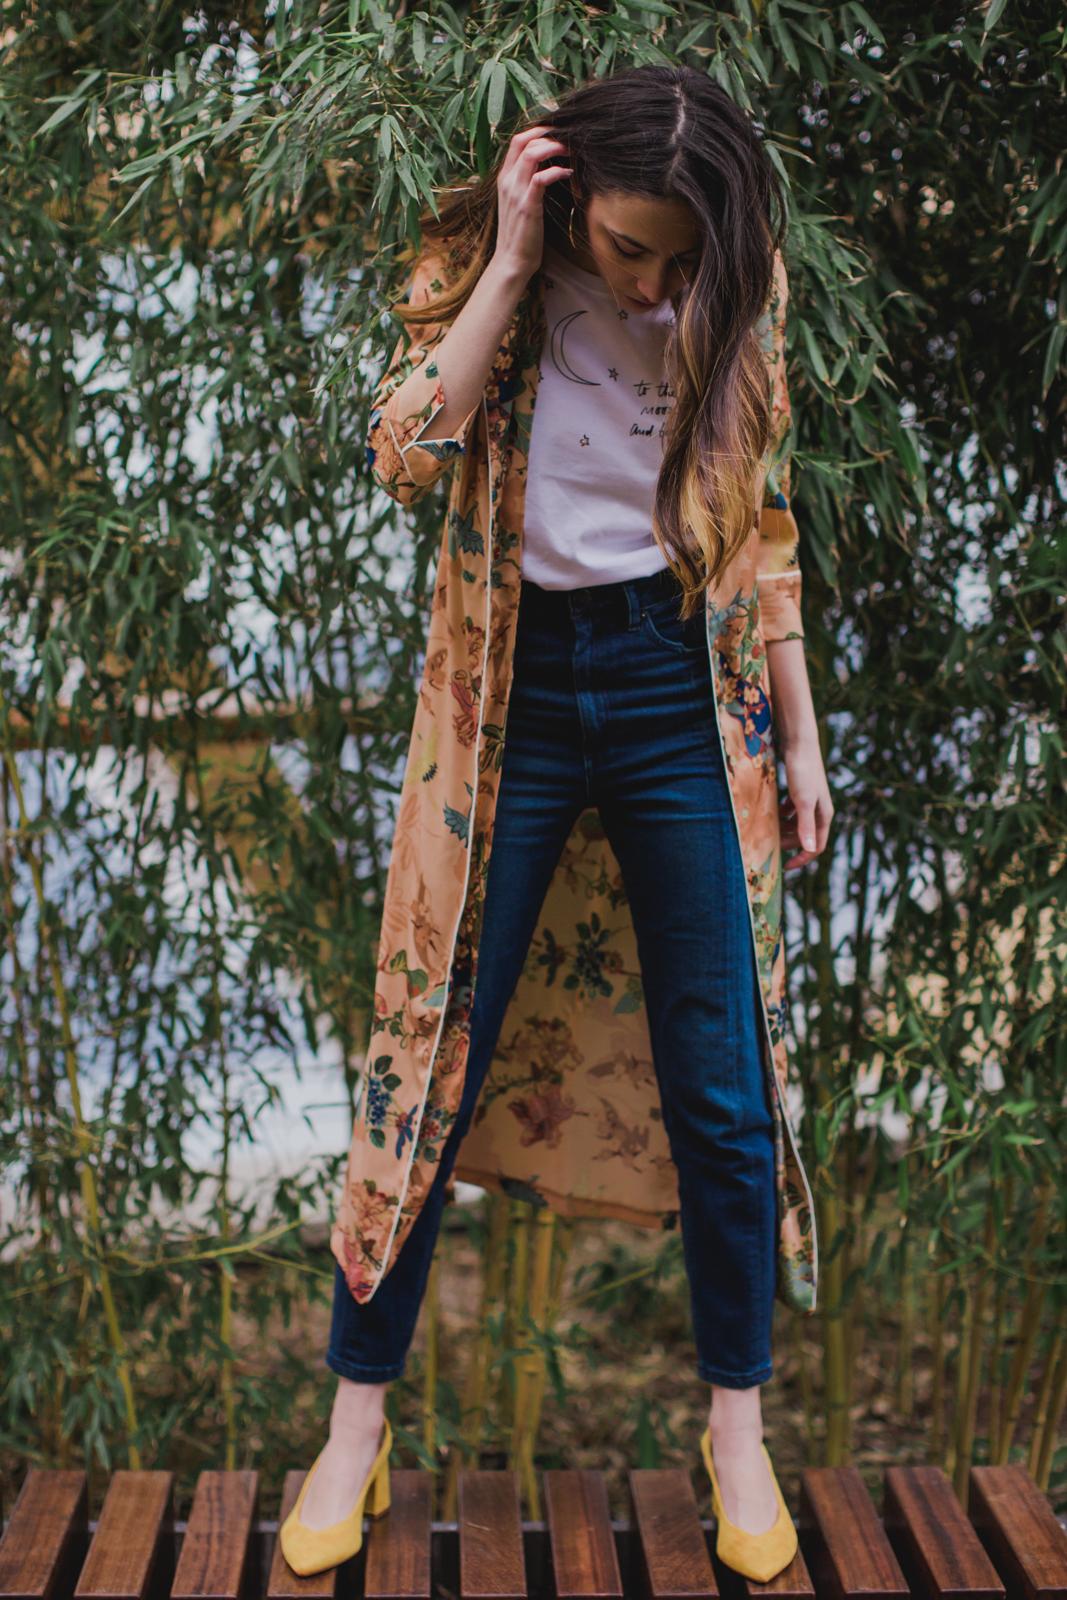 fashion-photographer-london-fashionstory-jasmina-haskovic-minas-planet-uk7.jpg